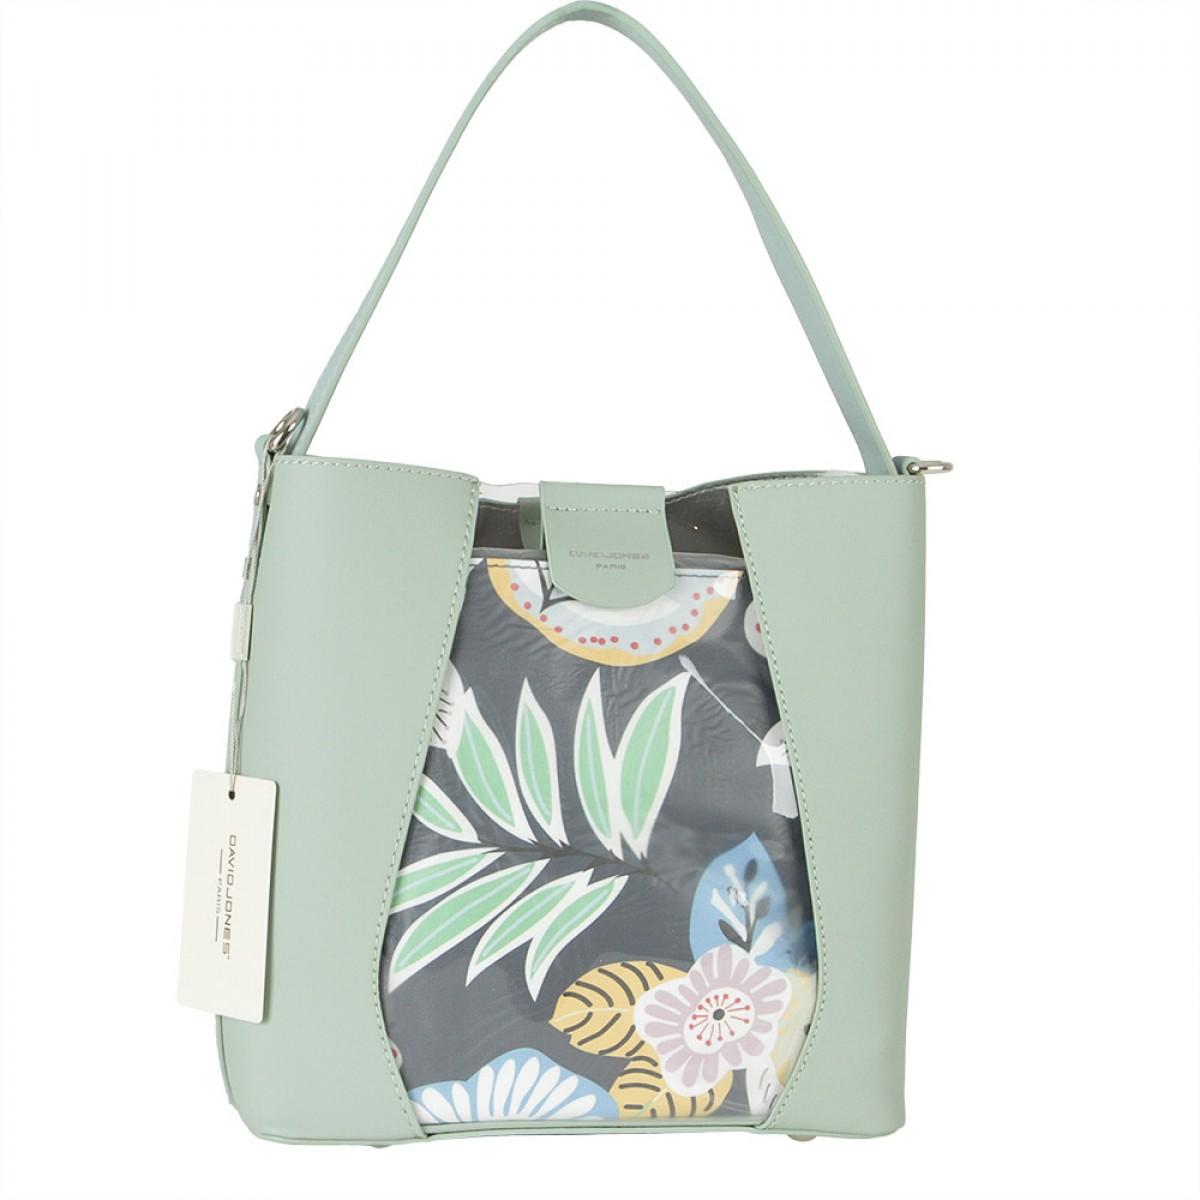 Жіноча сумка David Jones 6245-1 PALE GREEN